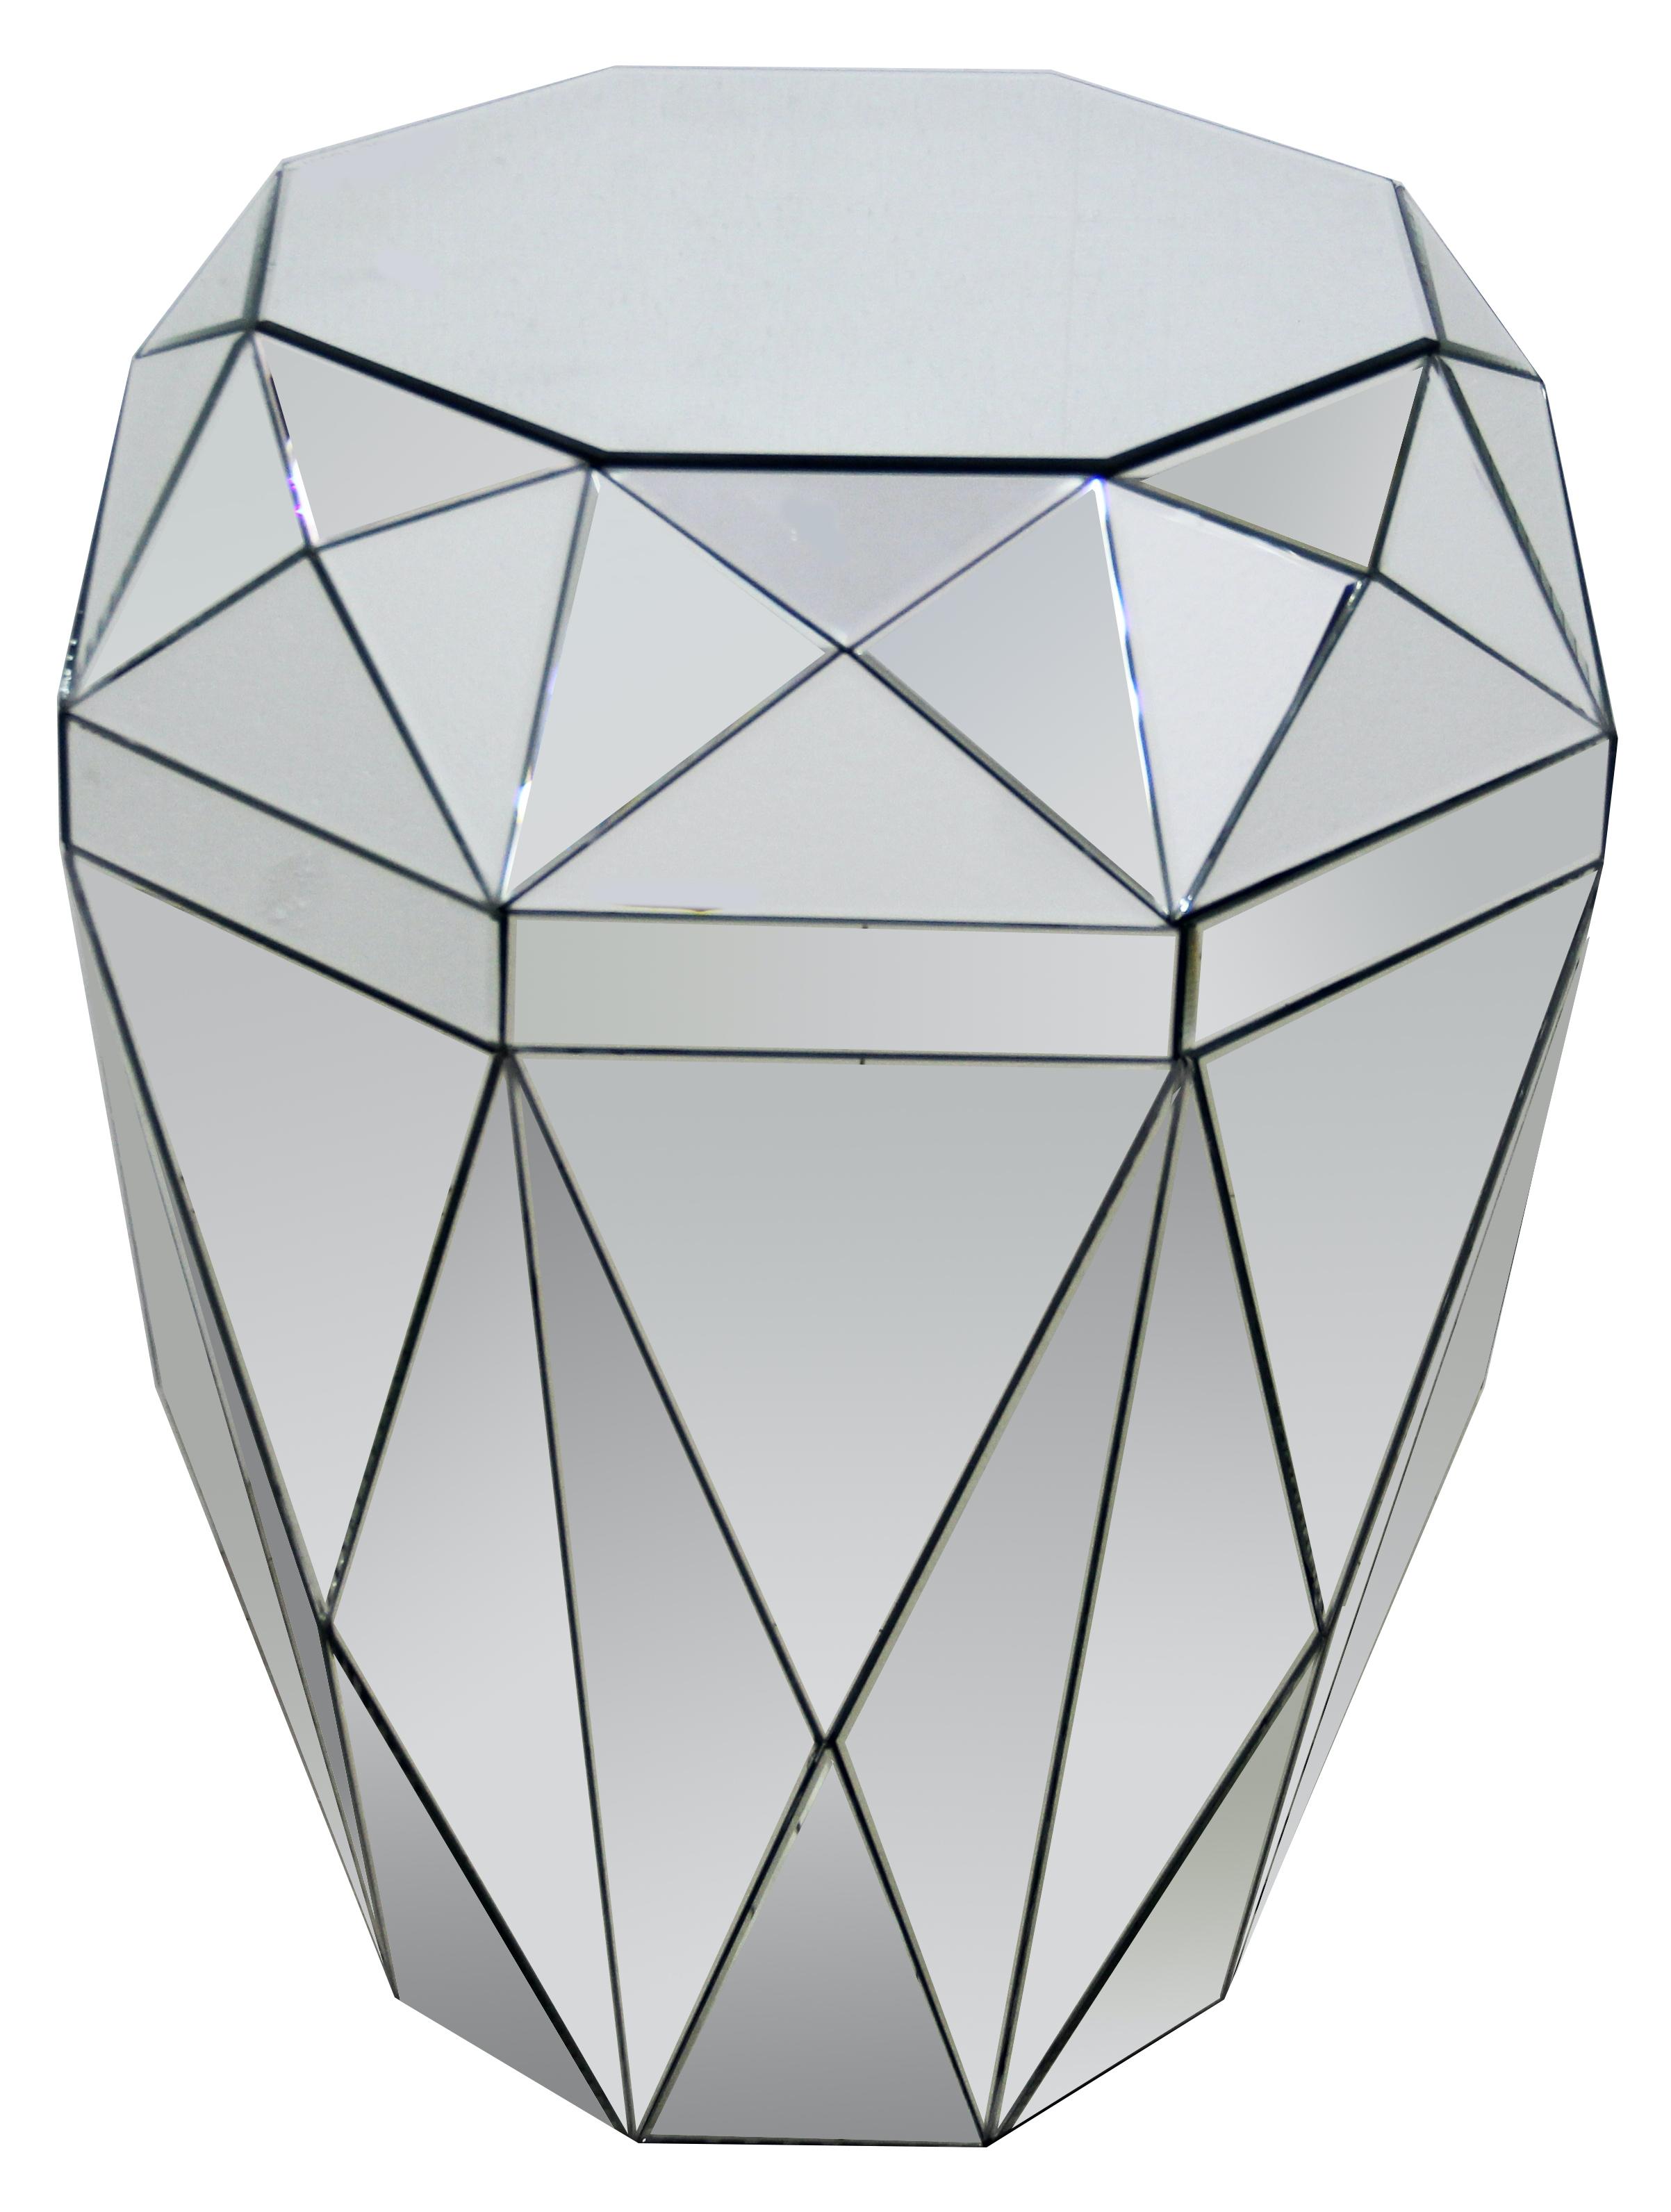 GE-1B037